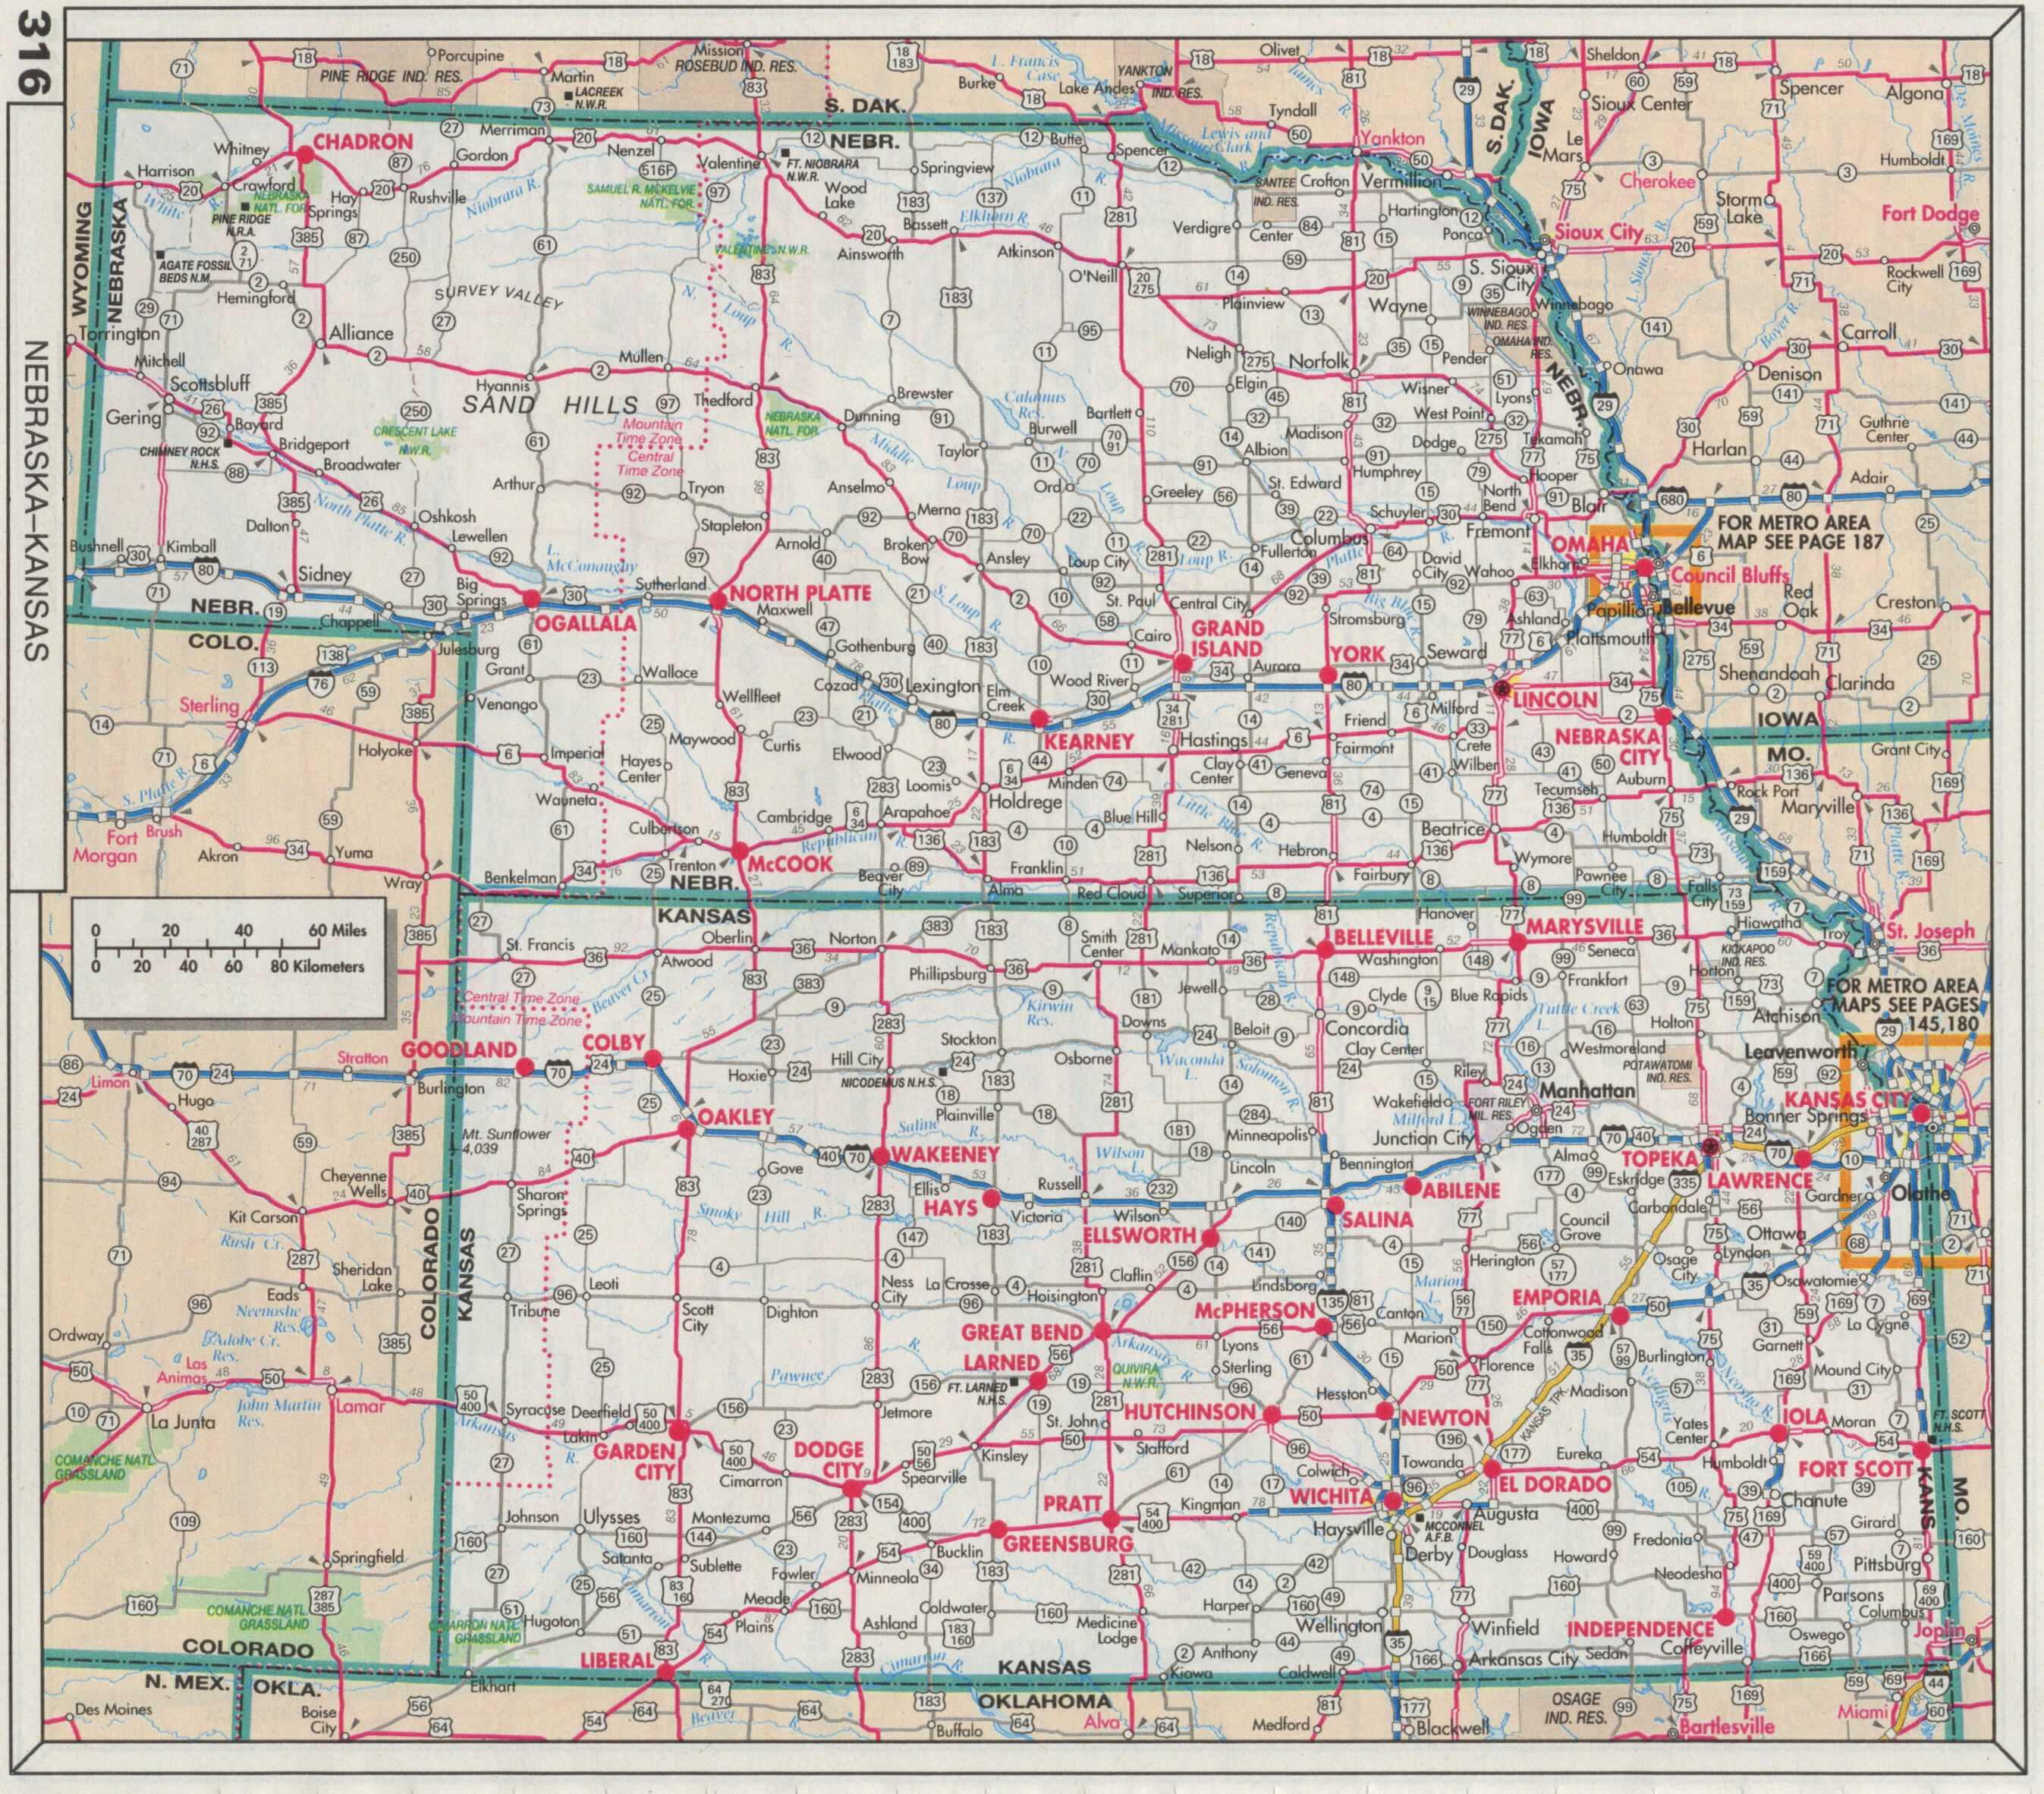 Modern highway map of Nebraska and Kansas.